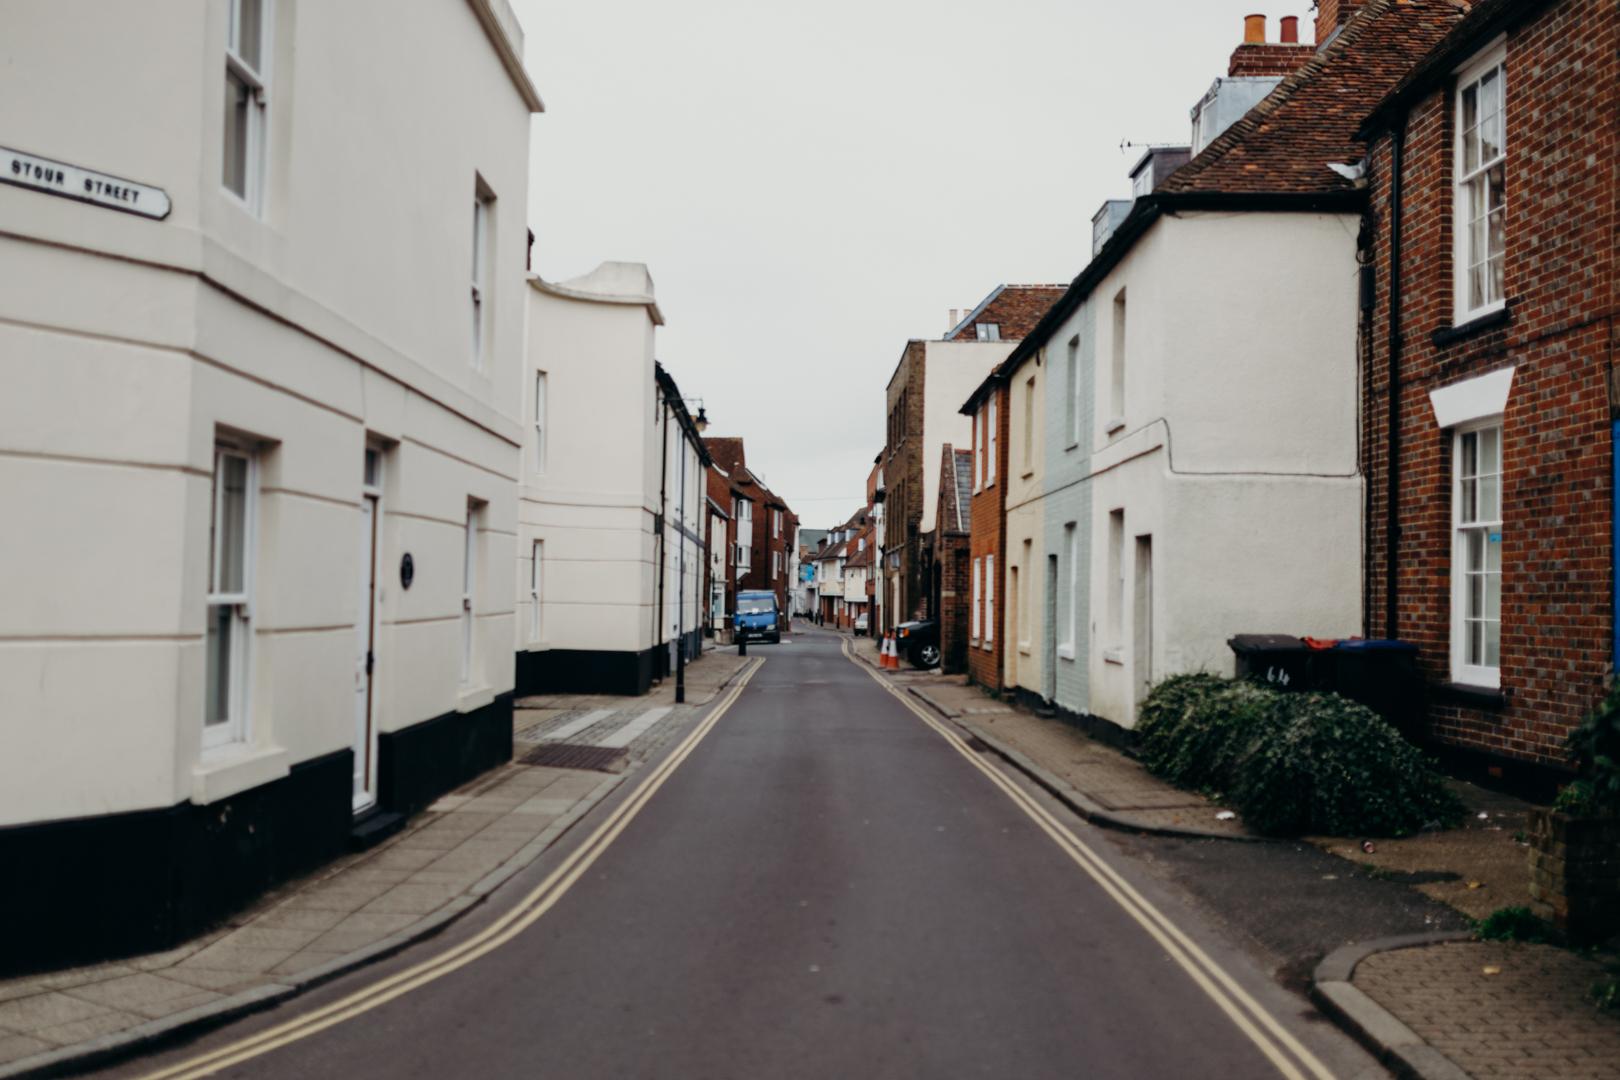 20151030_England_LondonCityGuide_39.jpg